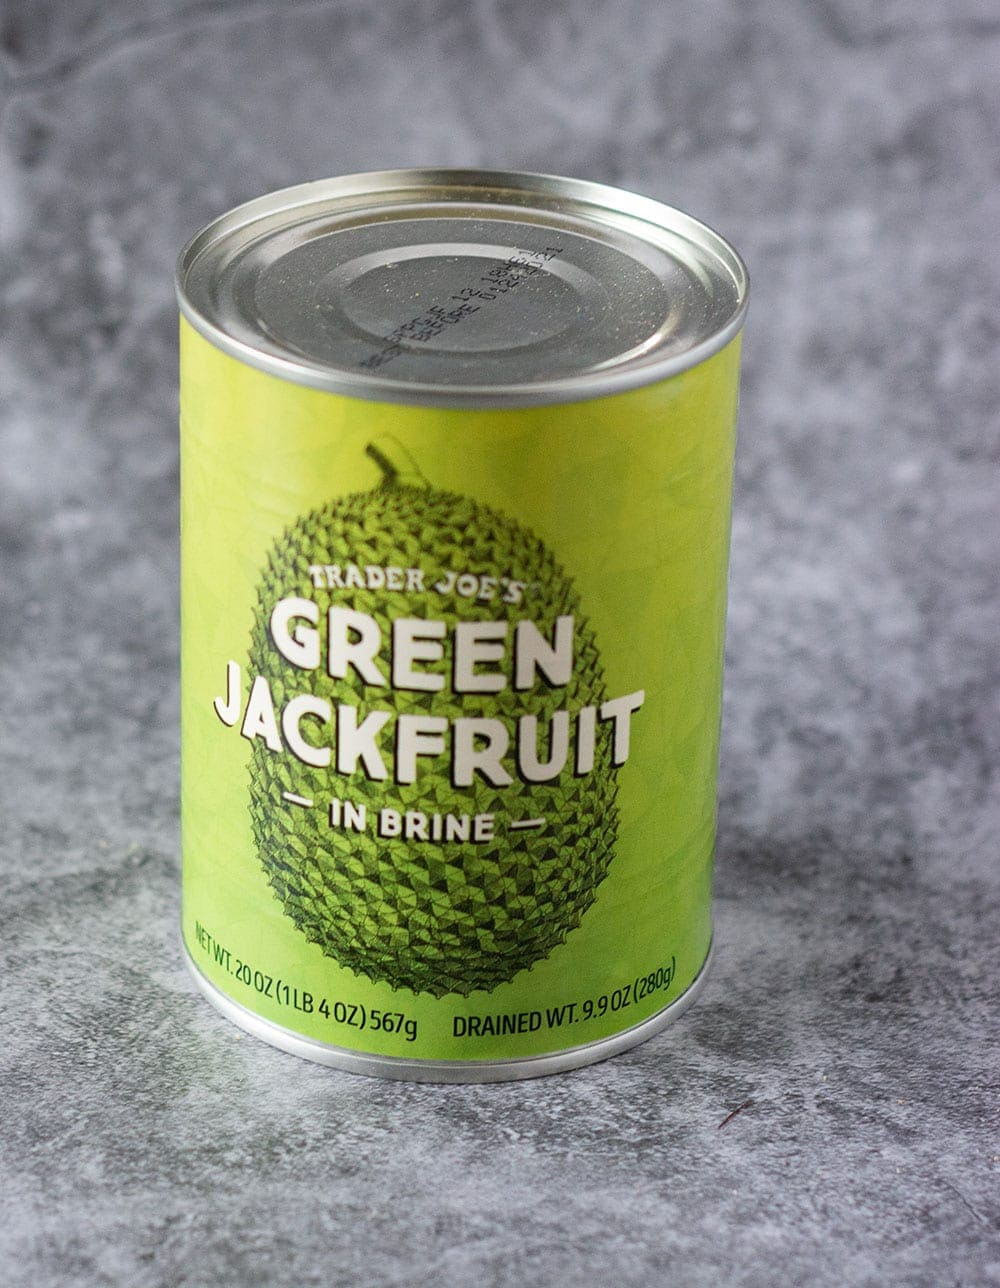 Green jackfruit for white bean stew